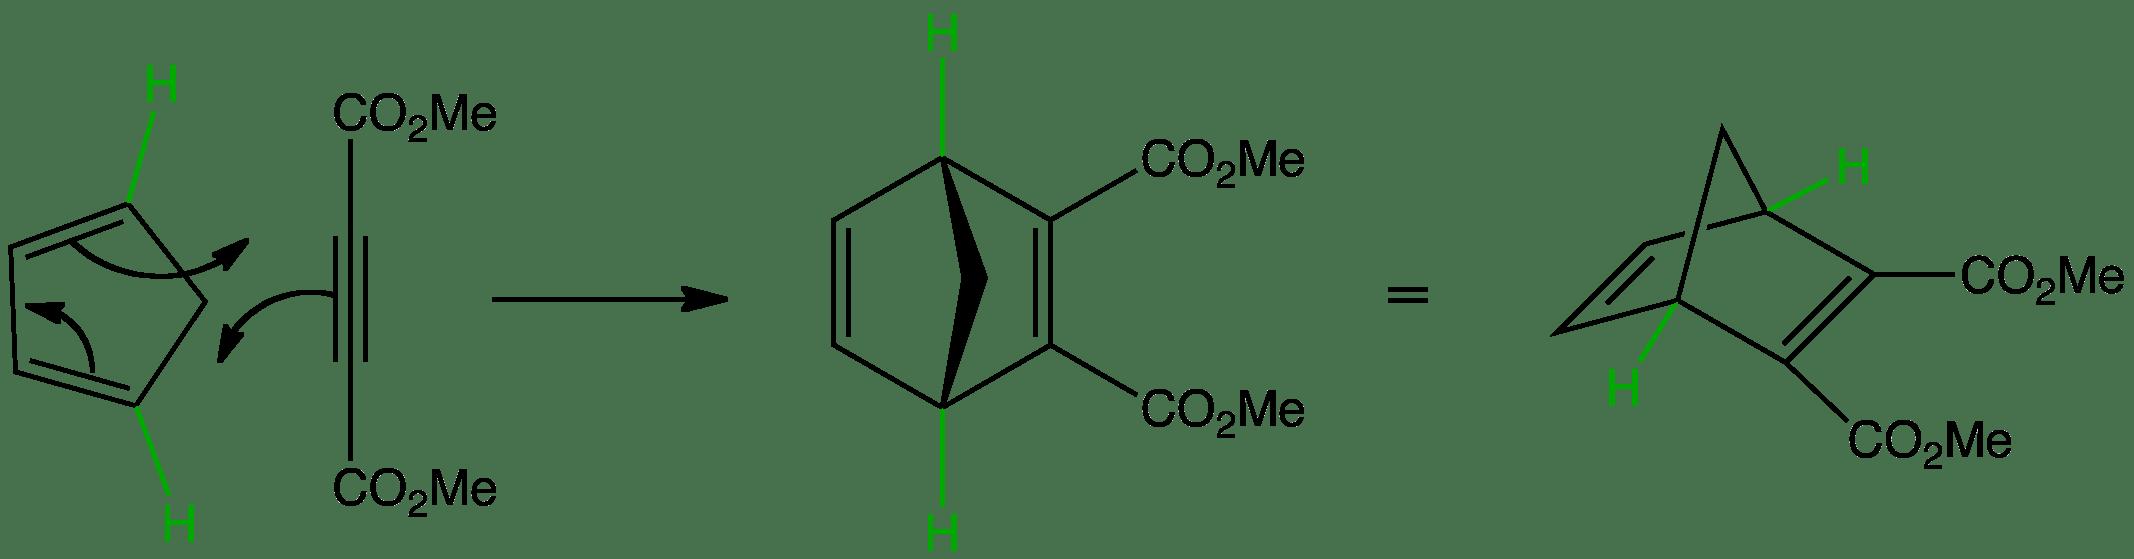 Diels Alder Z Z Cis Cis Diene Stereochemistry Of The